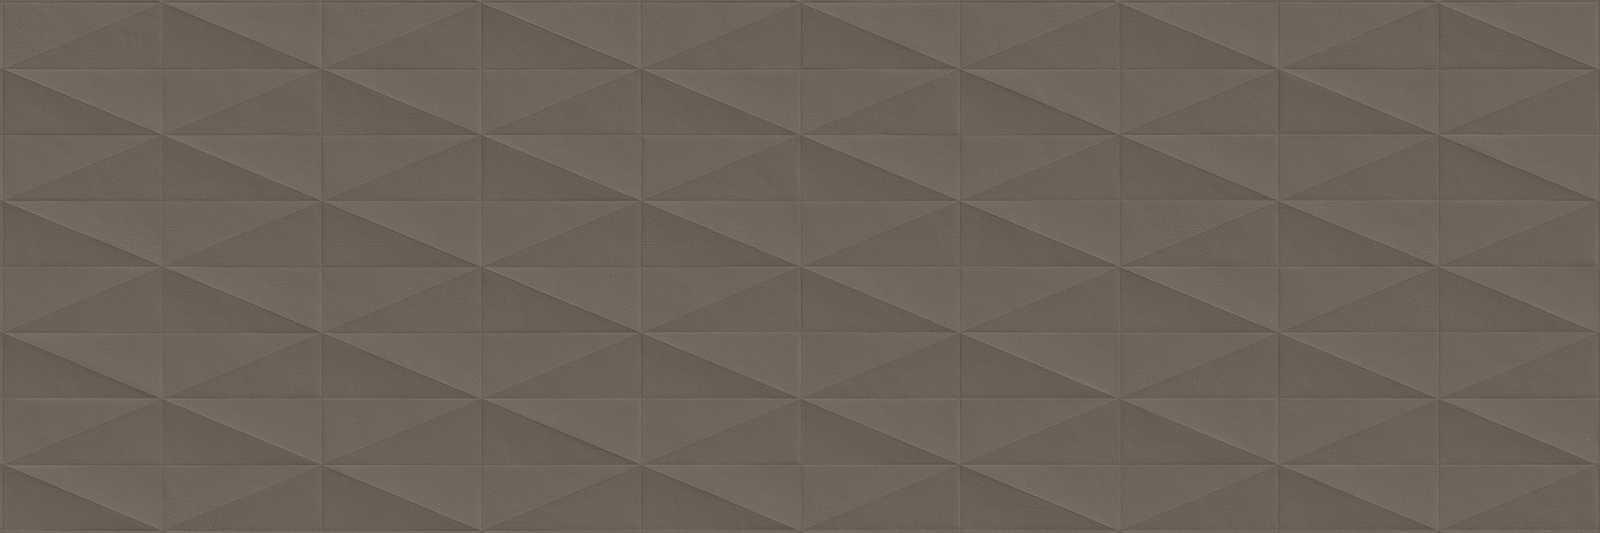 Стенни плочки Eclettica Taupe Stuttura Diamond 3D 40x120